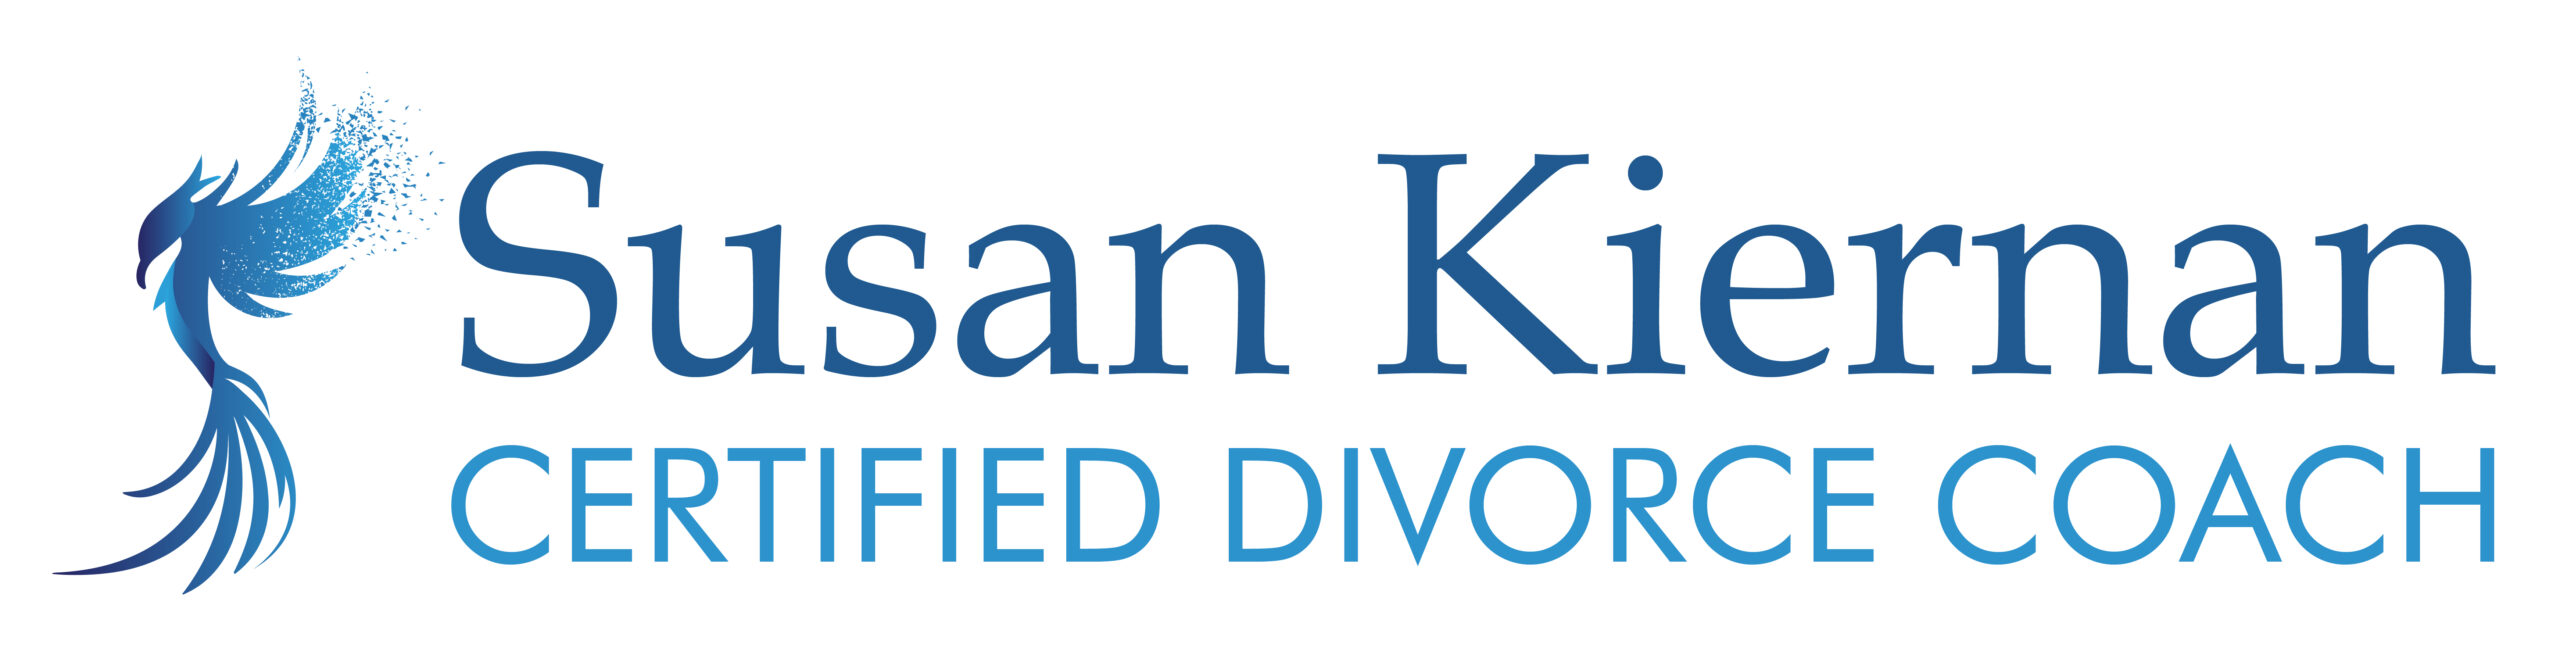 SusanKiernanCoaching.com